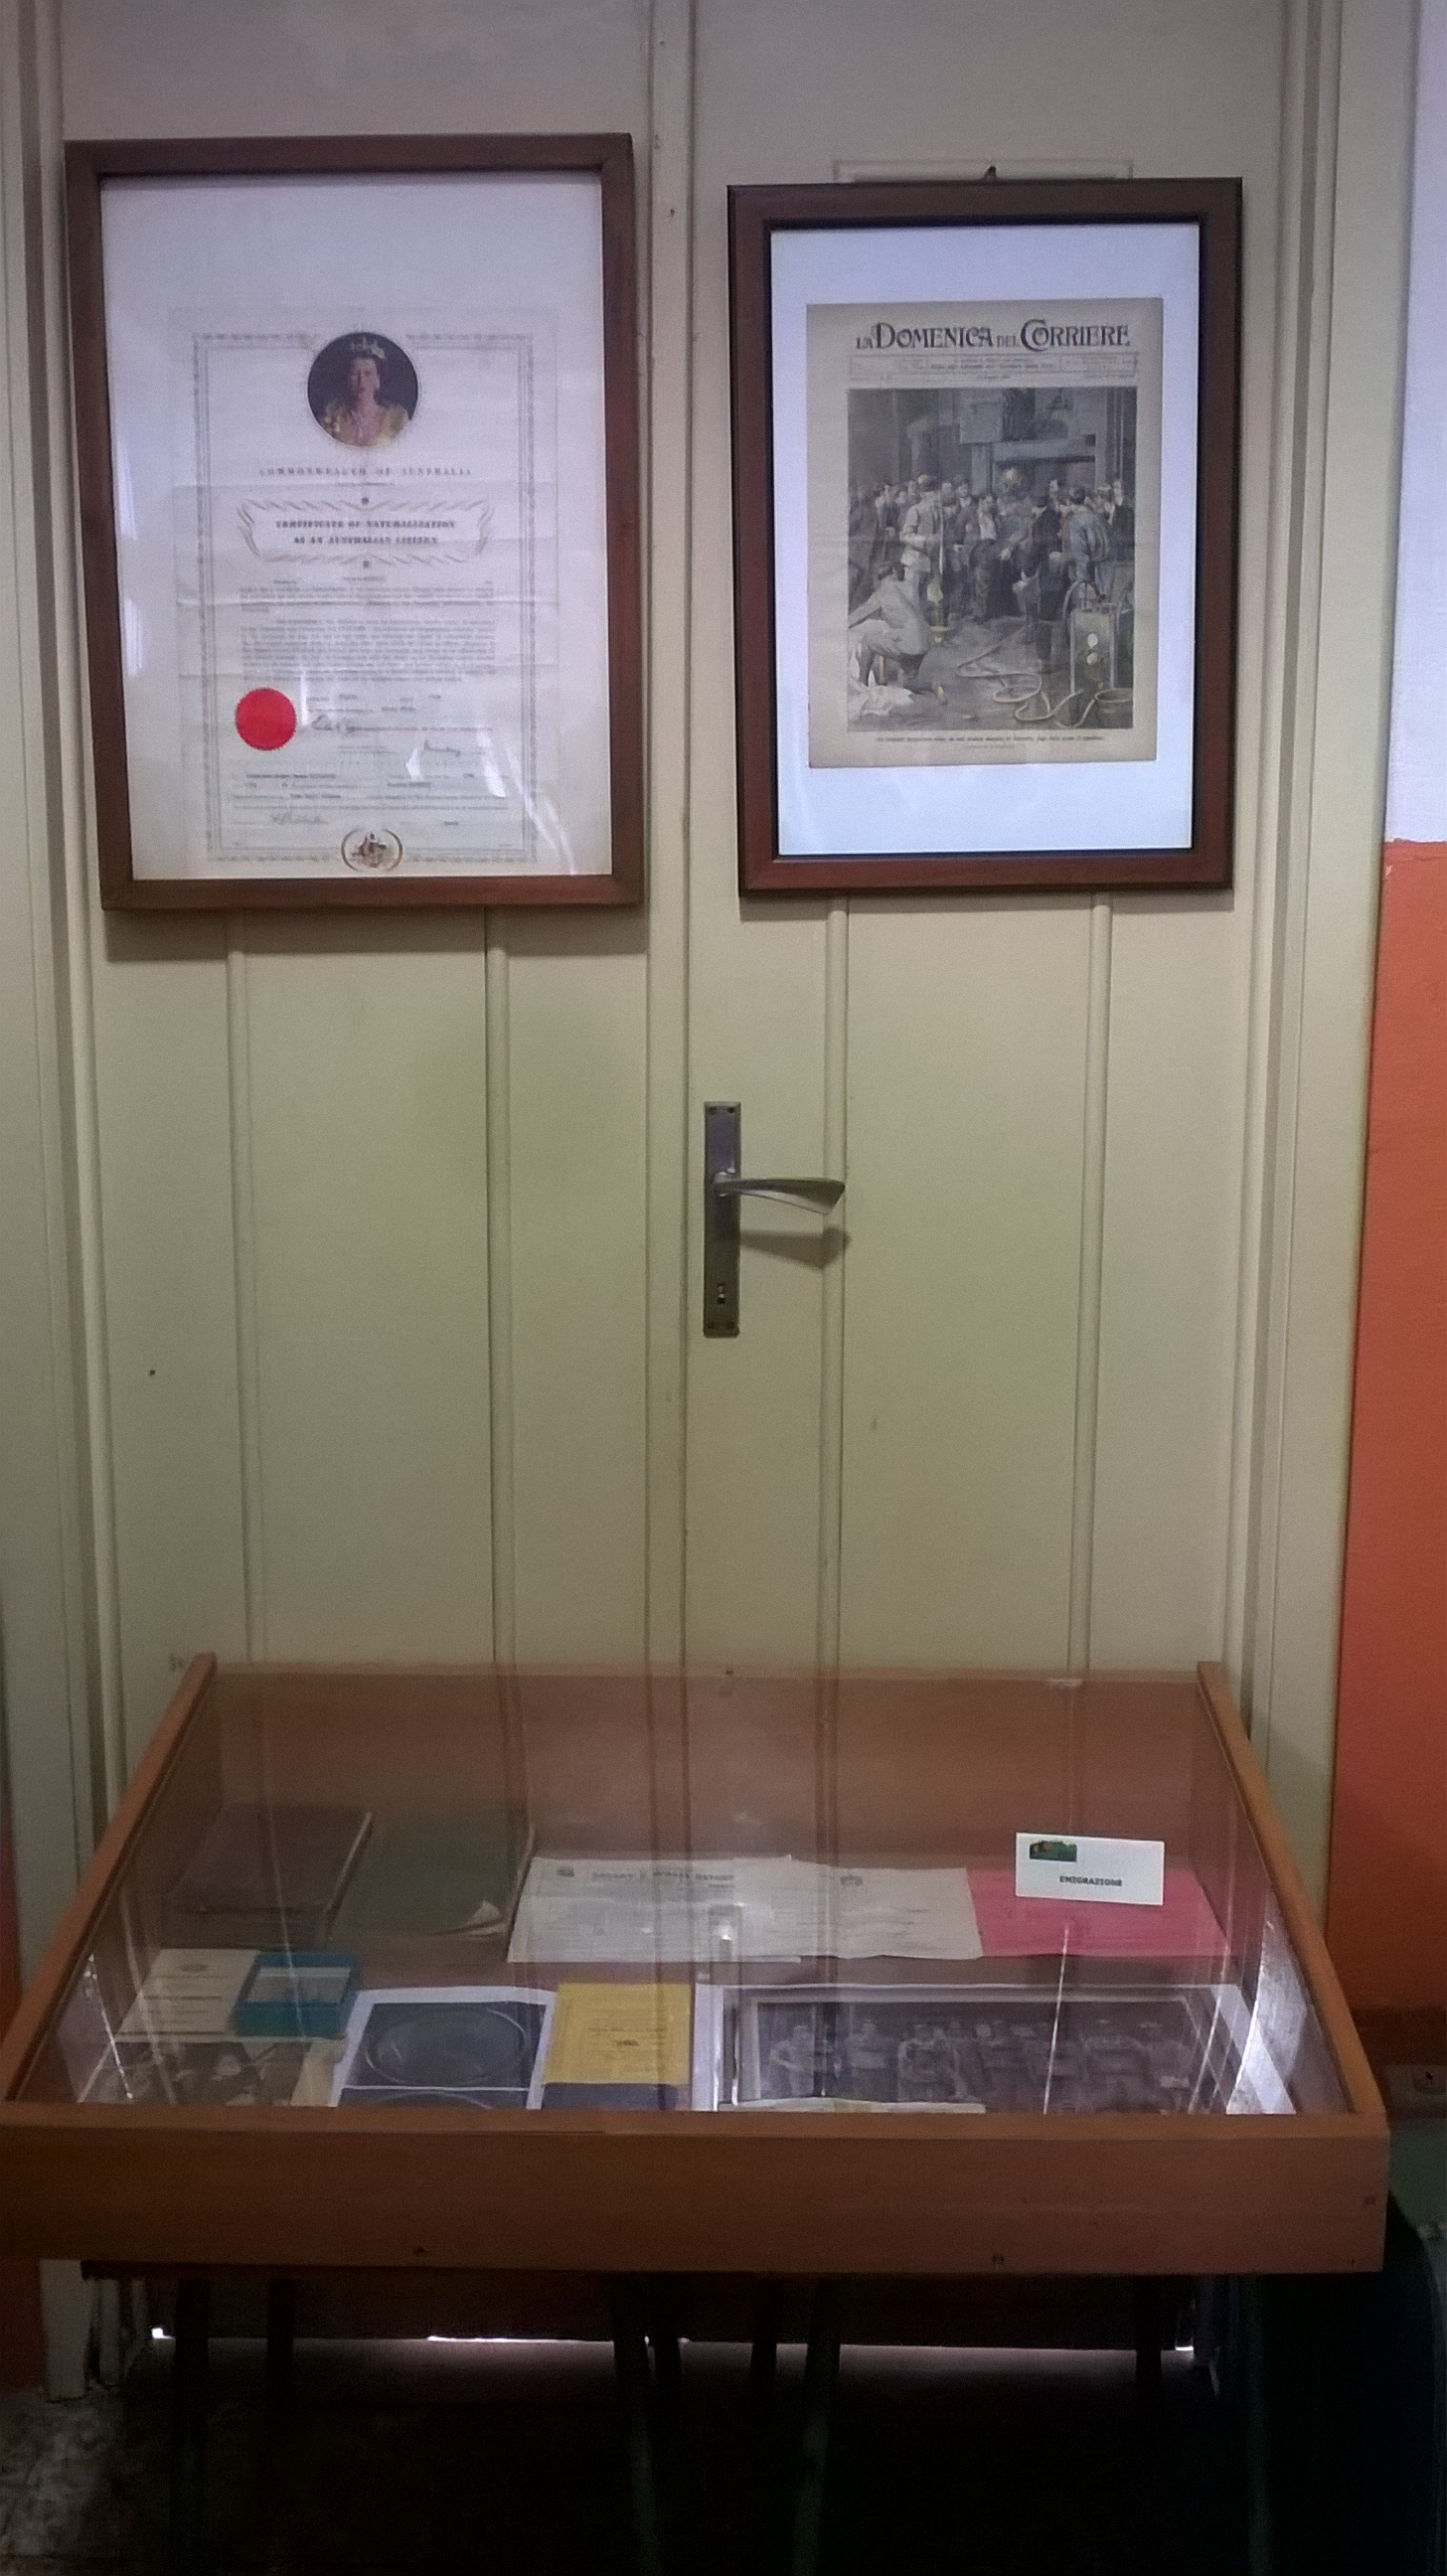 37_ITM 2016 Gorno_visita museo